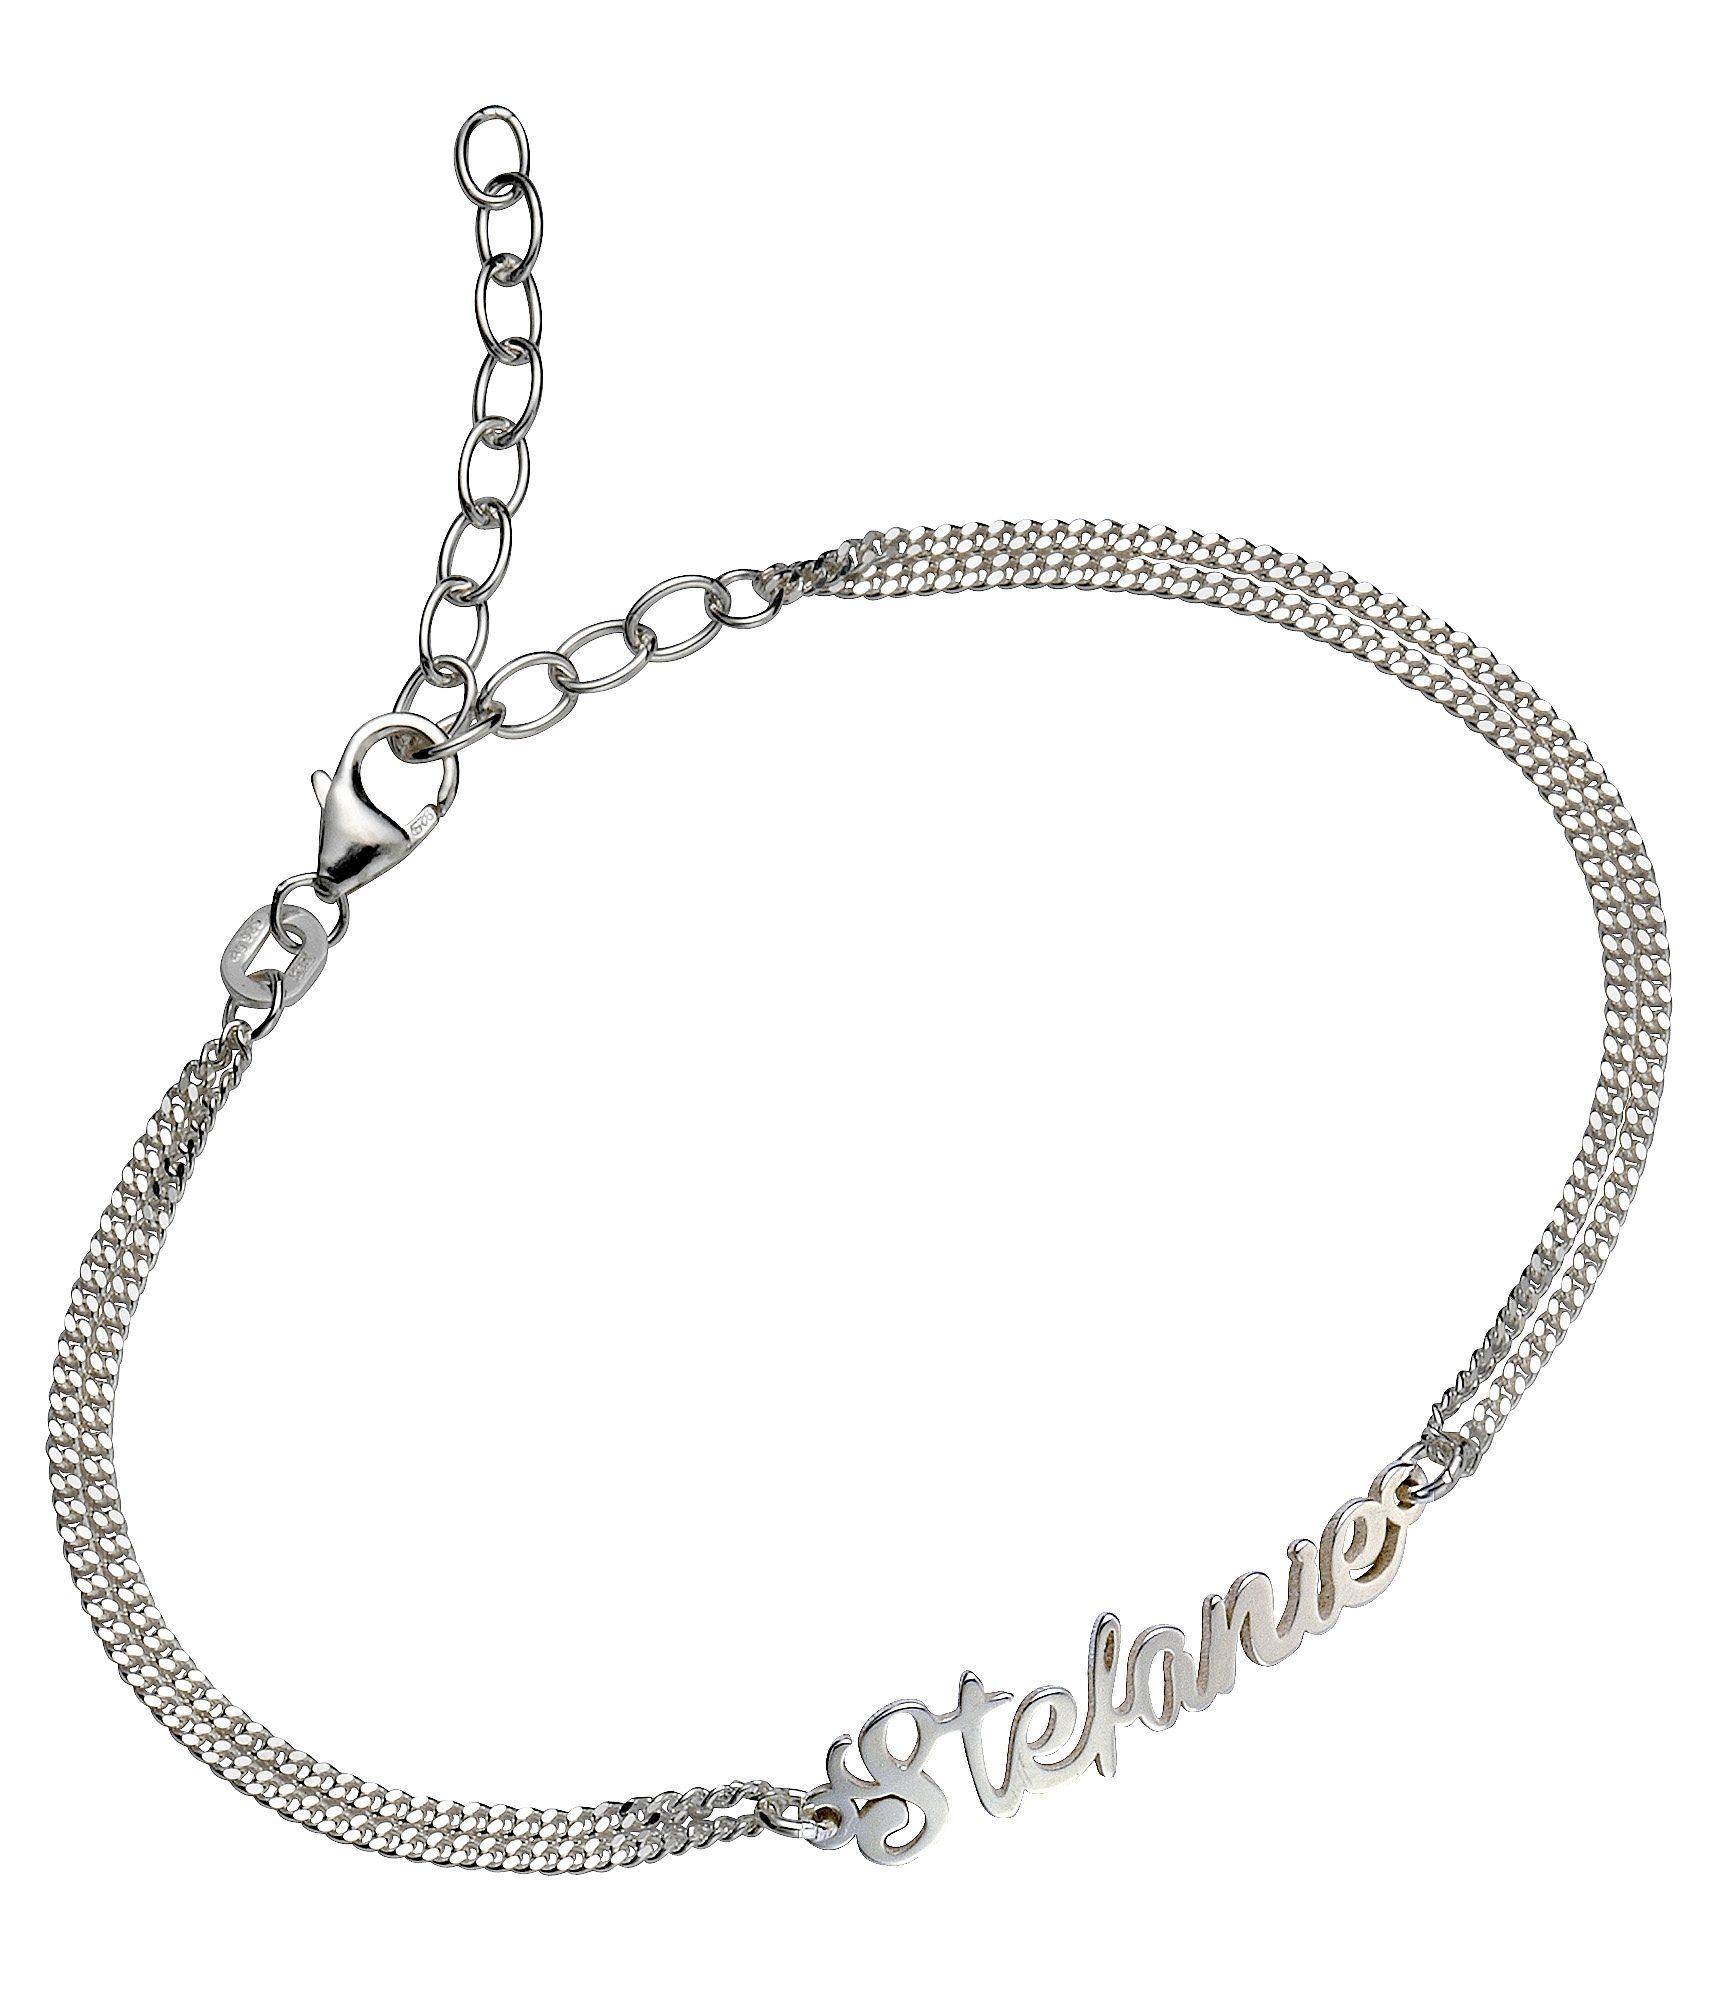 Firetti Armband »Namenskette als Armband in Panzerkettengliederung« | Schmuck > Halsketten > Namensketten | Firetti